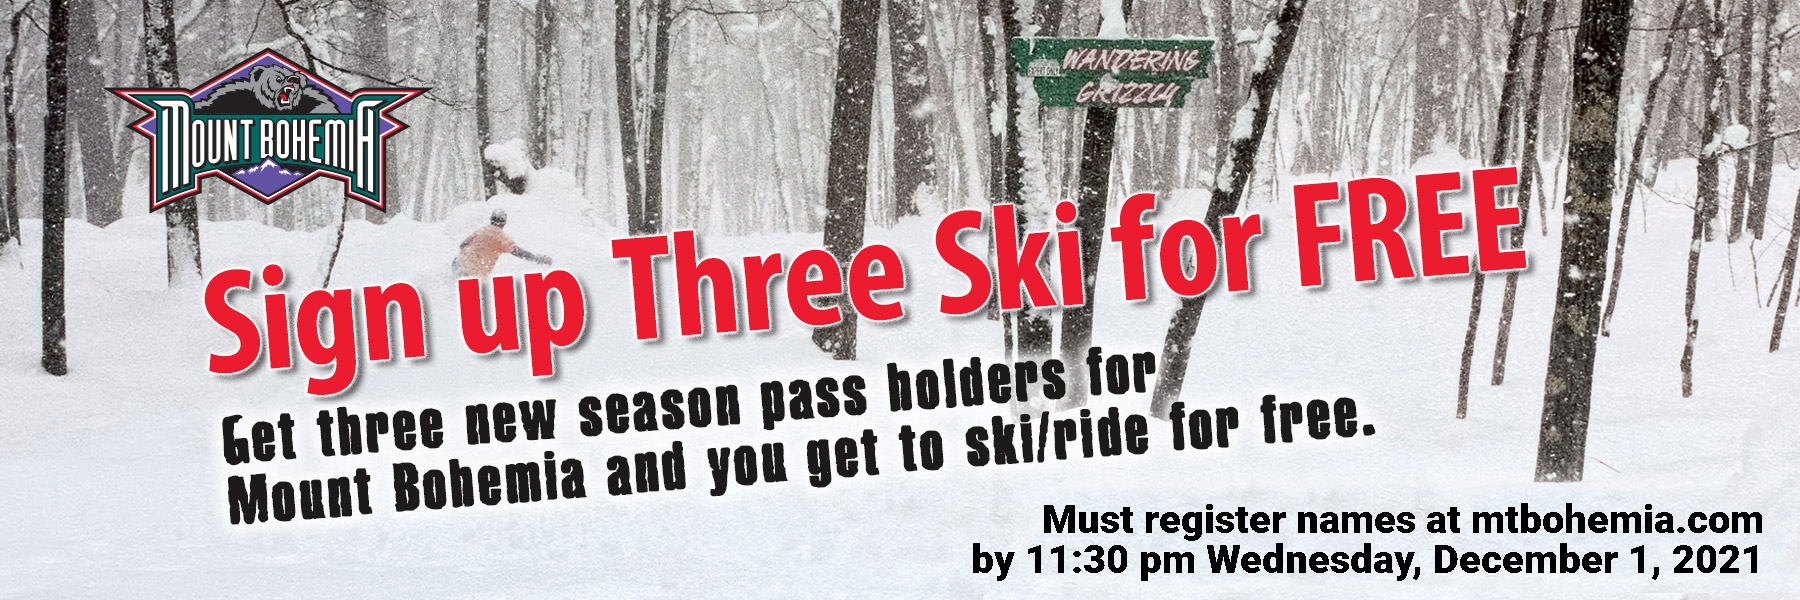 2021 Sign up Three Ski Free